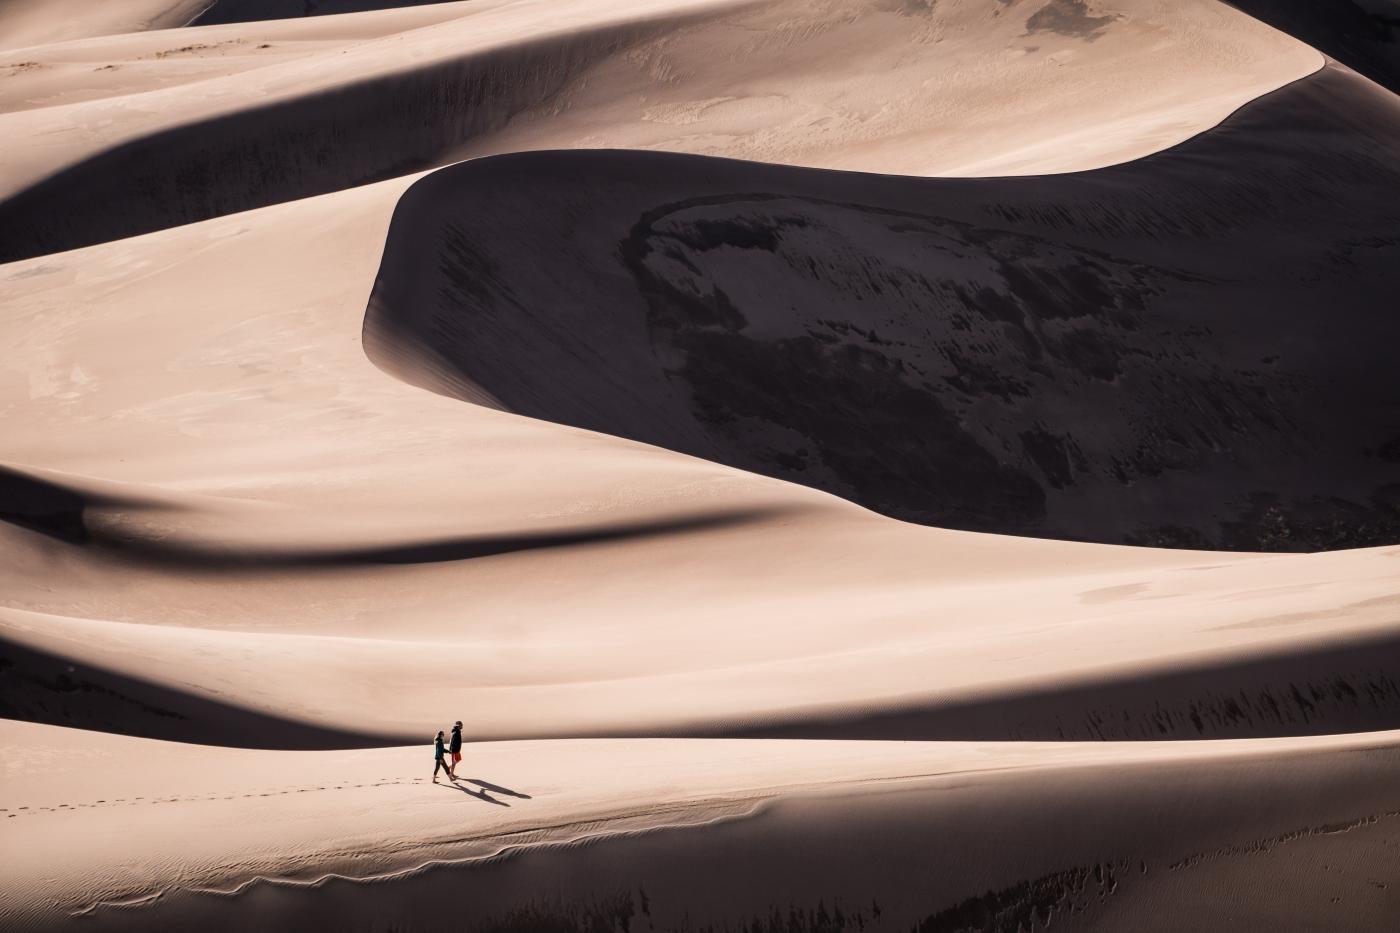 Camping at Sand Dunes